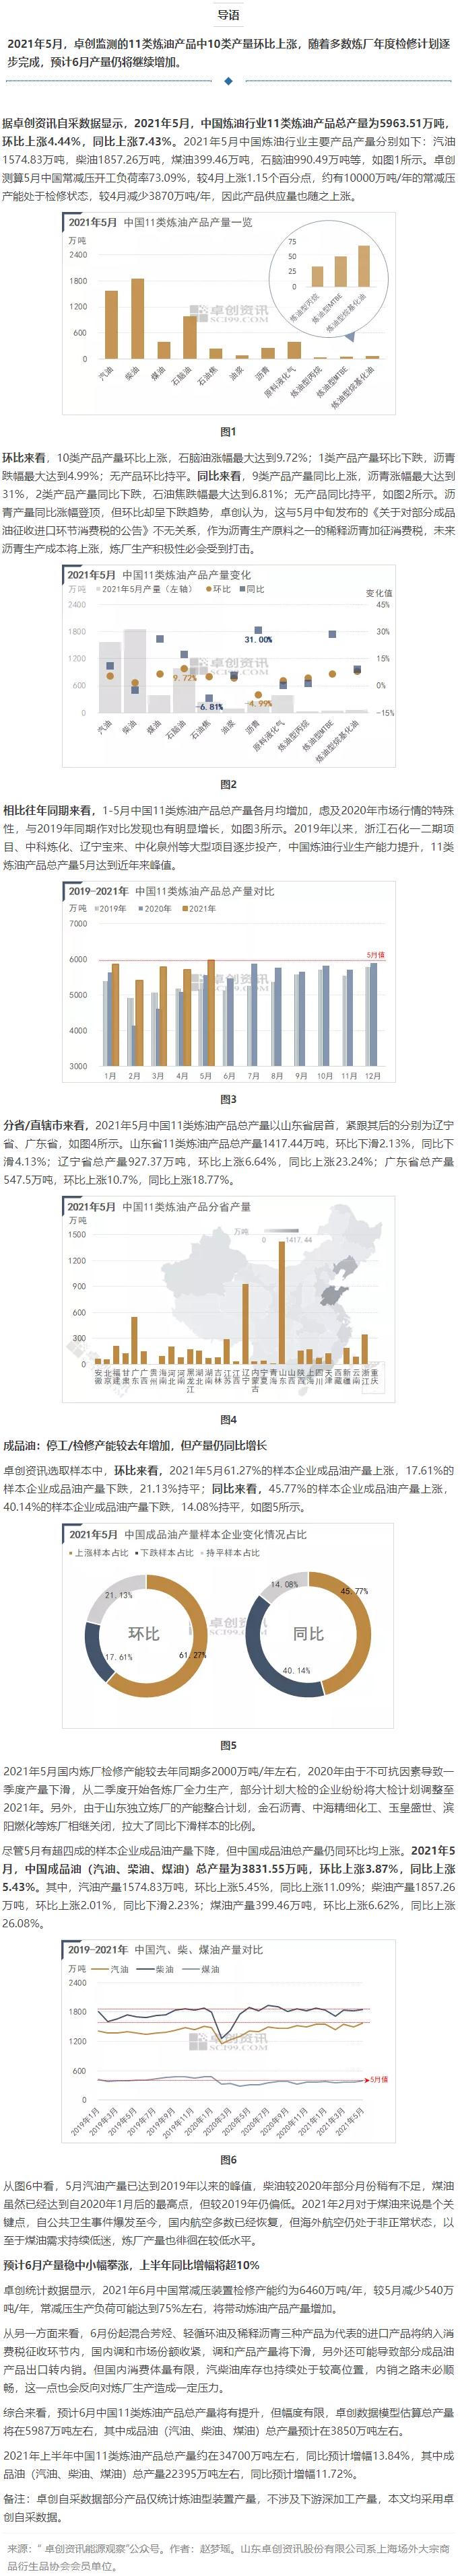 FireShot Capture 173 - 【会员观点】卓创资讯:2021年5月中国主要炼油产品产量分析 - mp.weixin.qq.com.png